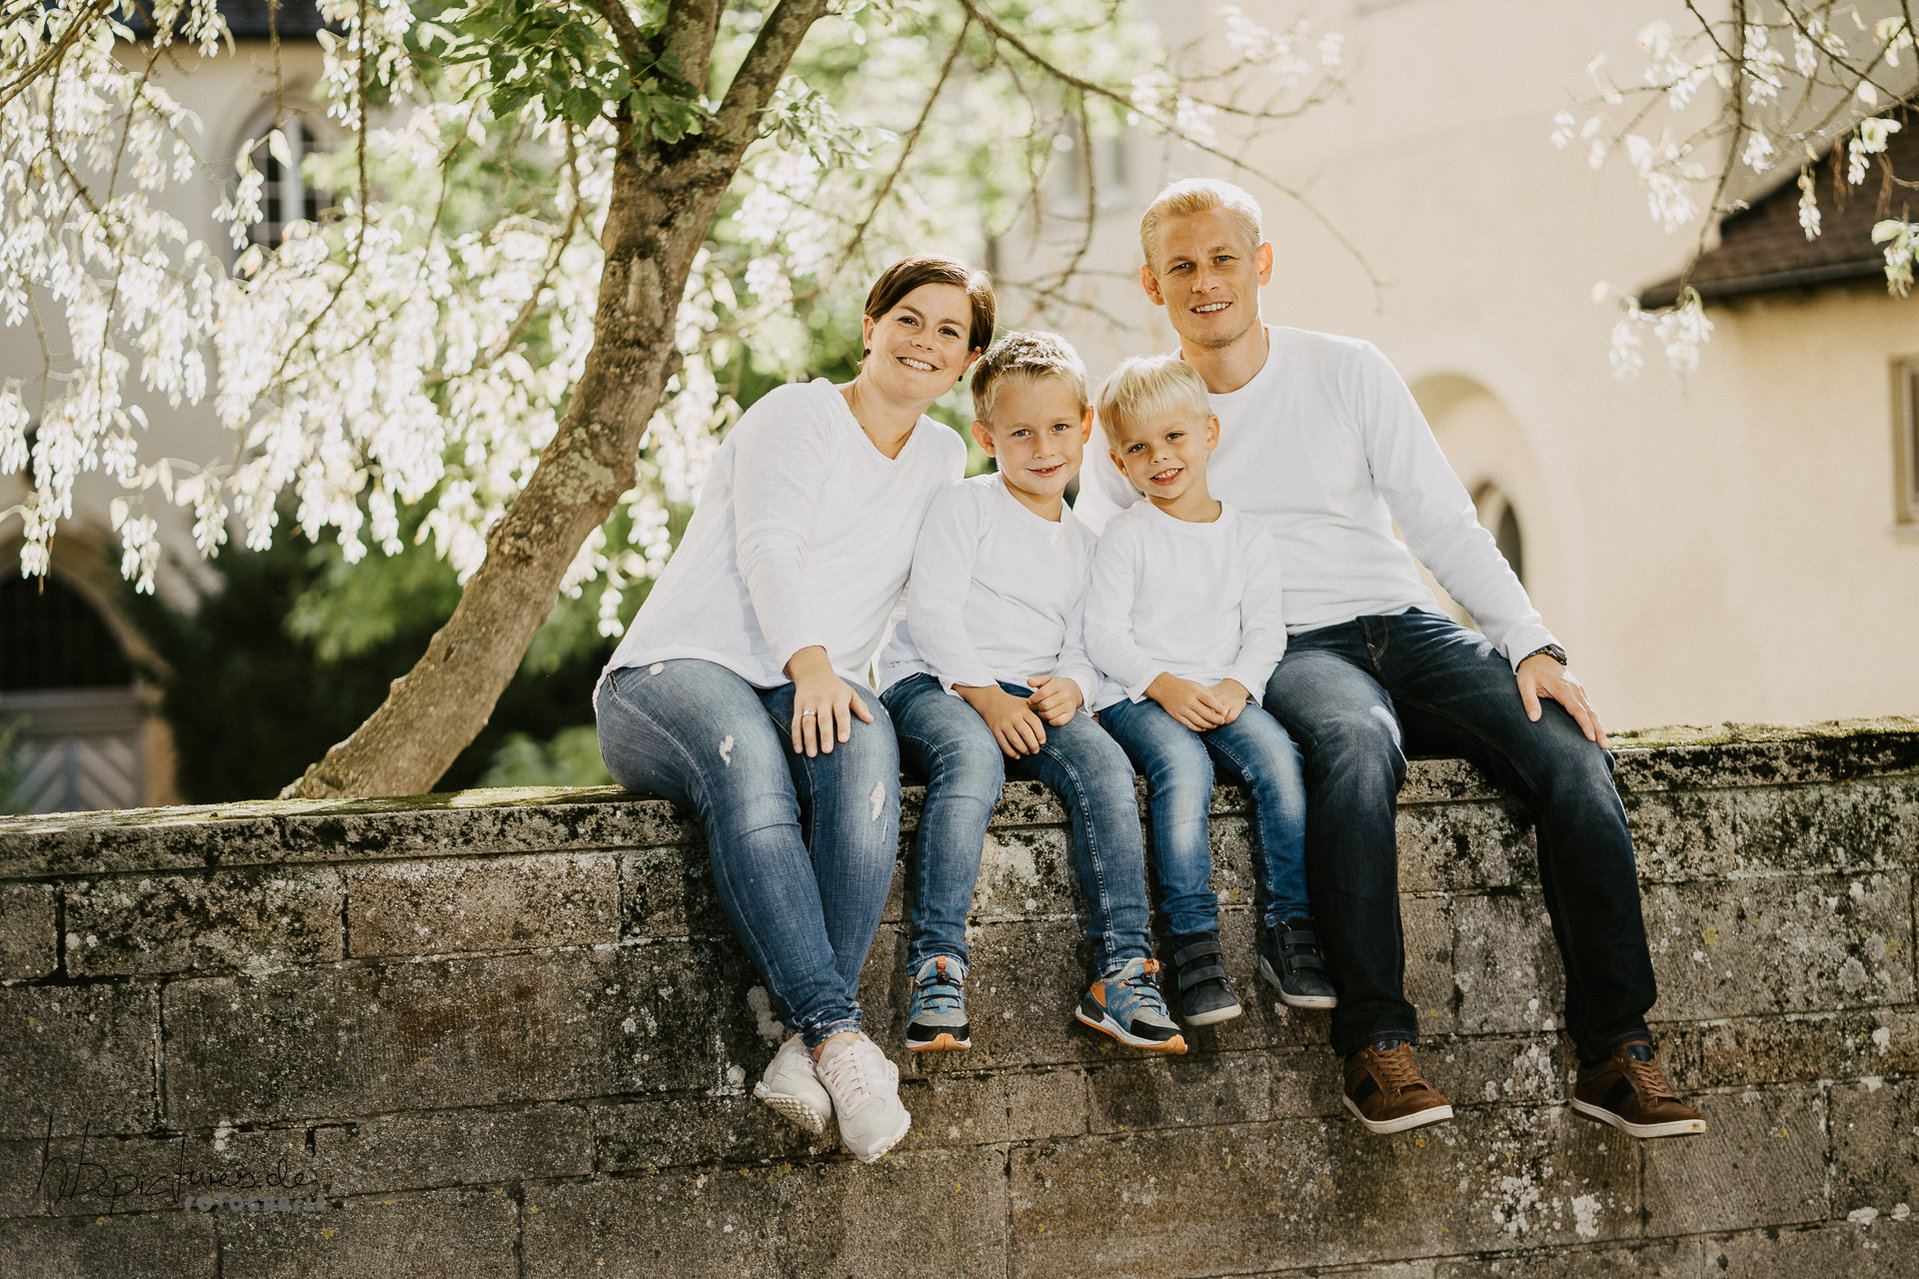 855-Fotostudio-BRENDEL-Familienfotos-GCj3xK18